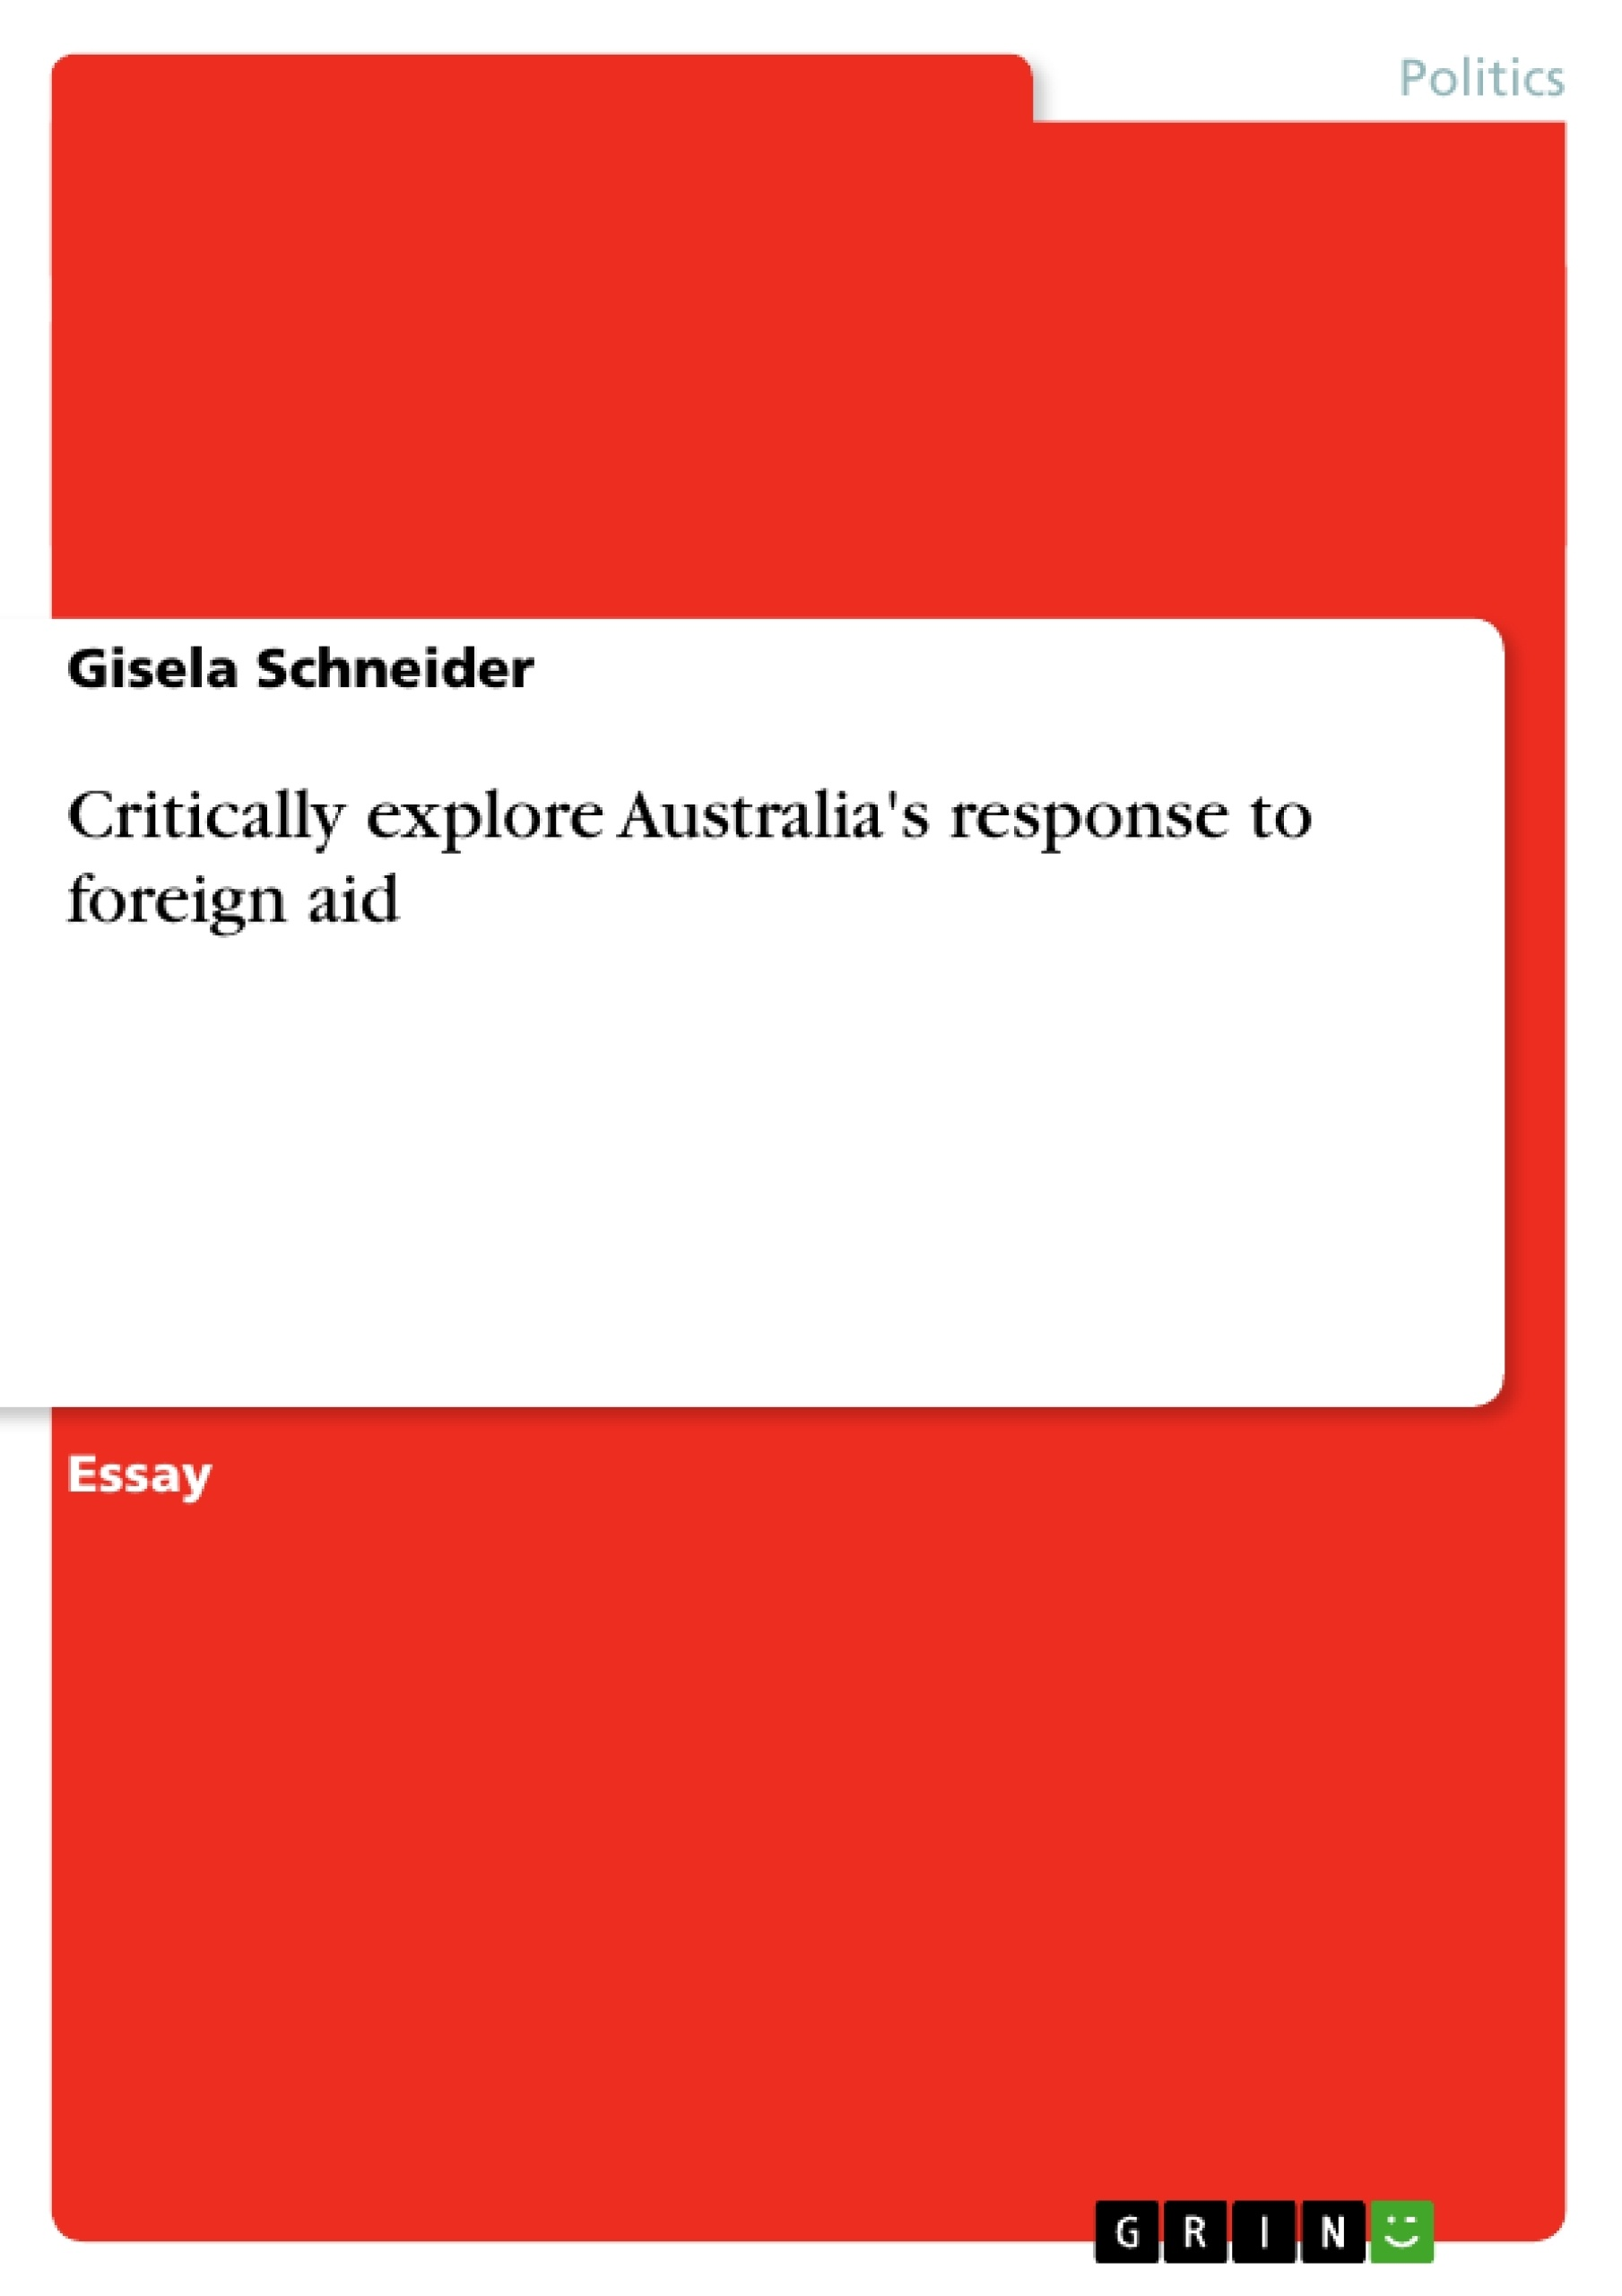 Title: Critically explore Australia's response to foreign aid